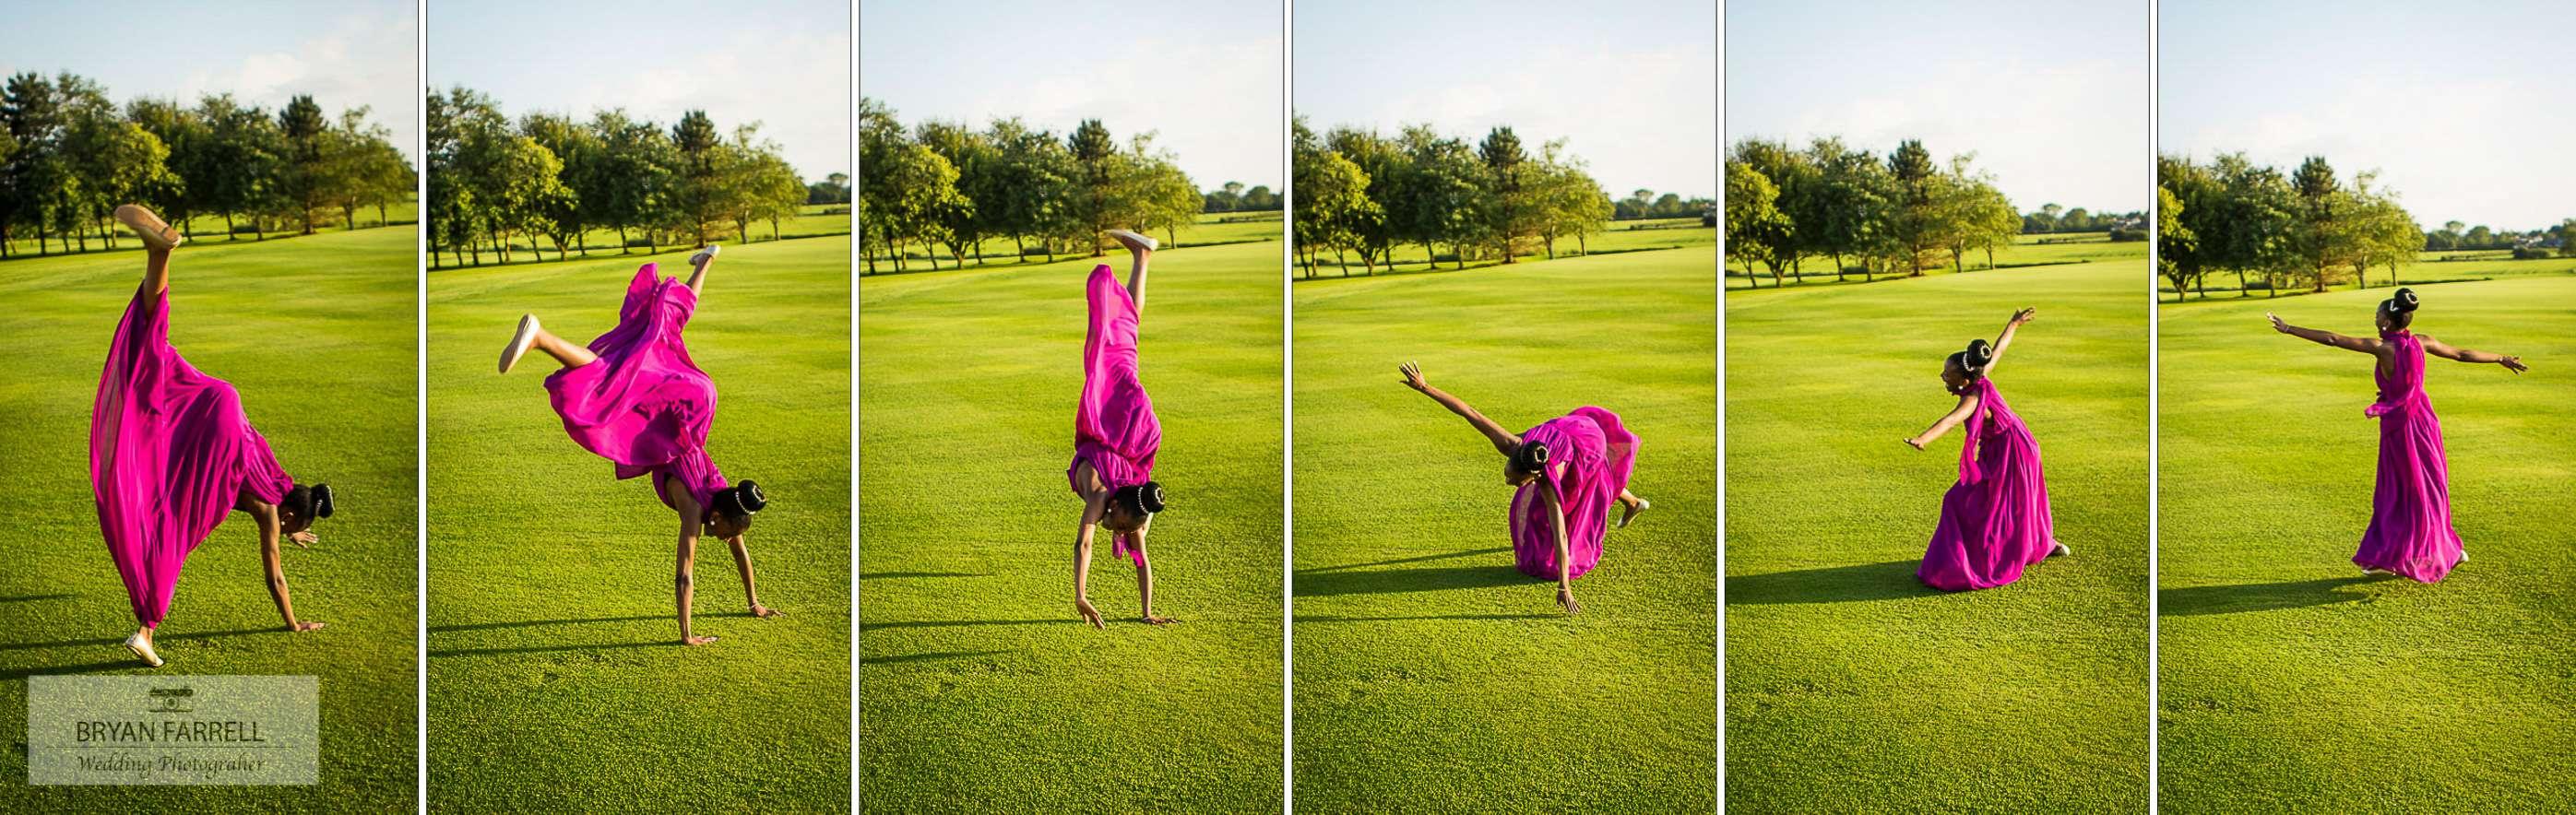 Garstang Golf Club wedding 174